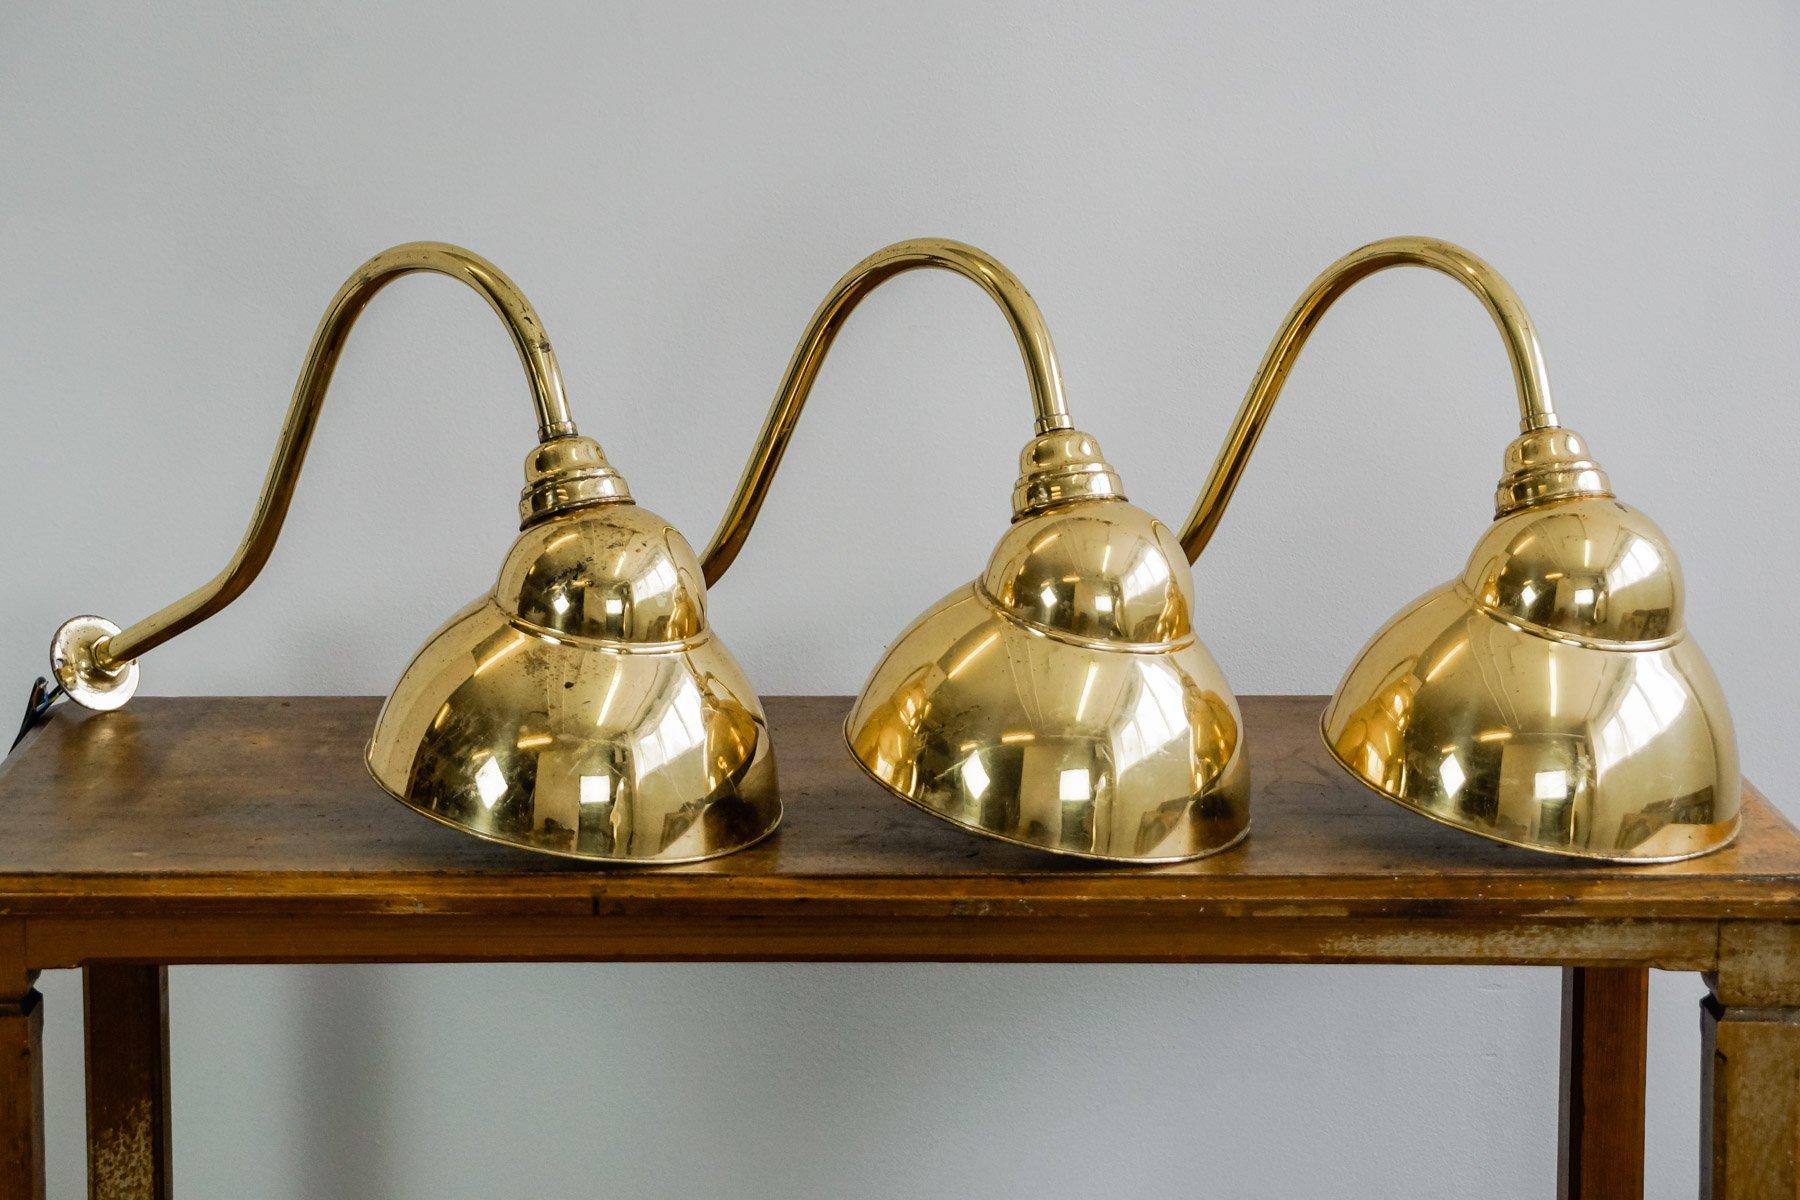 Englische Vintage Messing Spotlight Wandlampe, 1920er